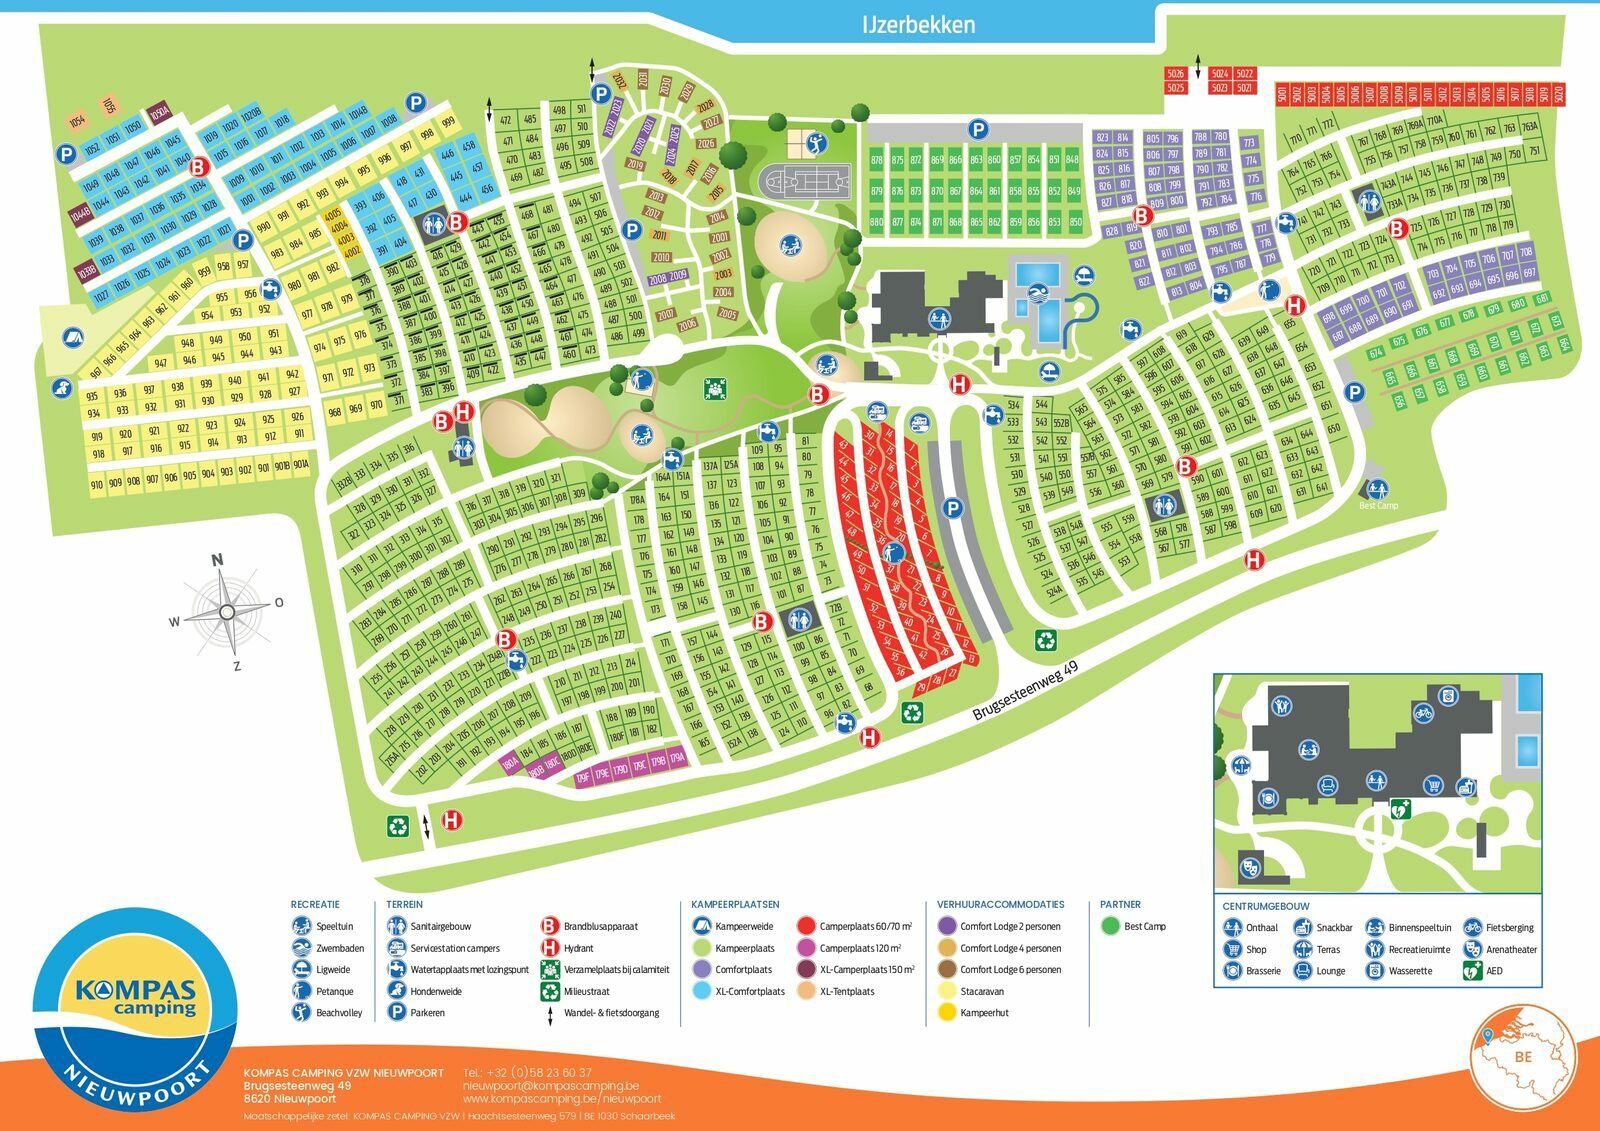 KP_Nieuwpoort_plattegrond_2021_v01_page-0001_6f4a7063-788b-4349-8266-72f816665119.jpg